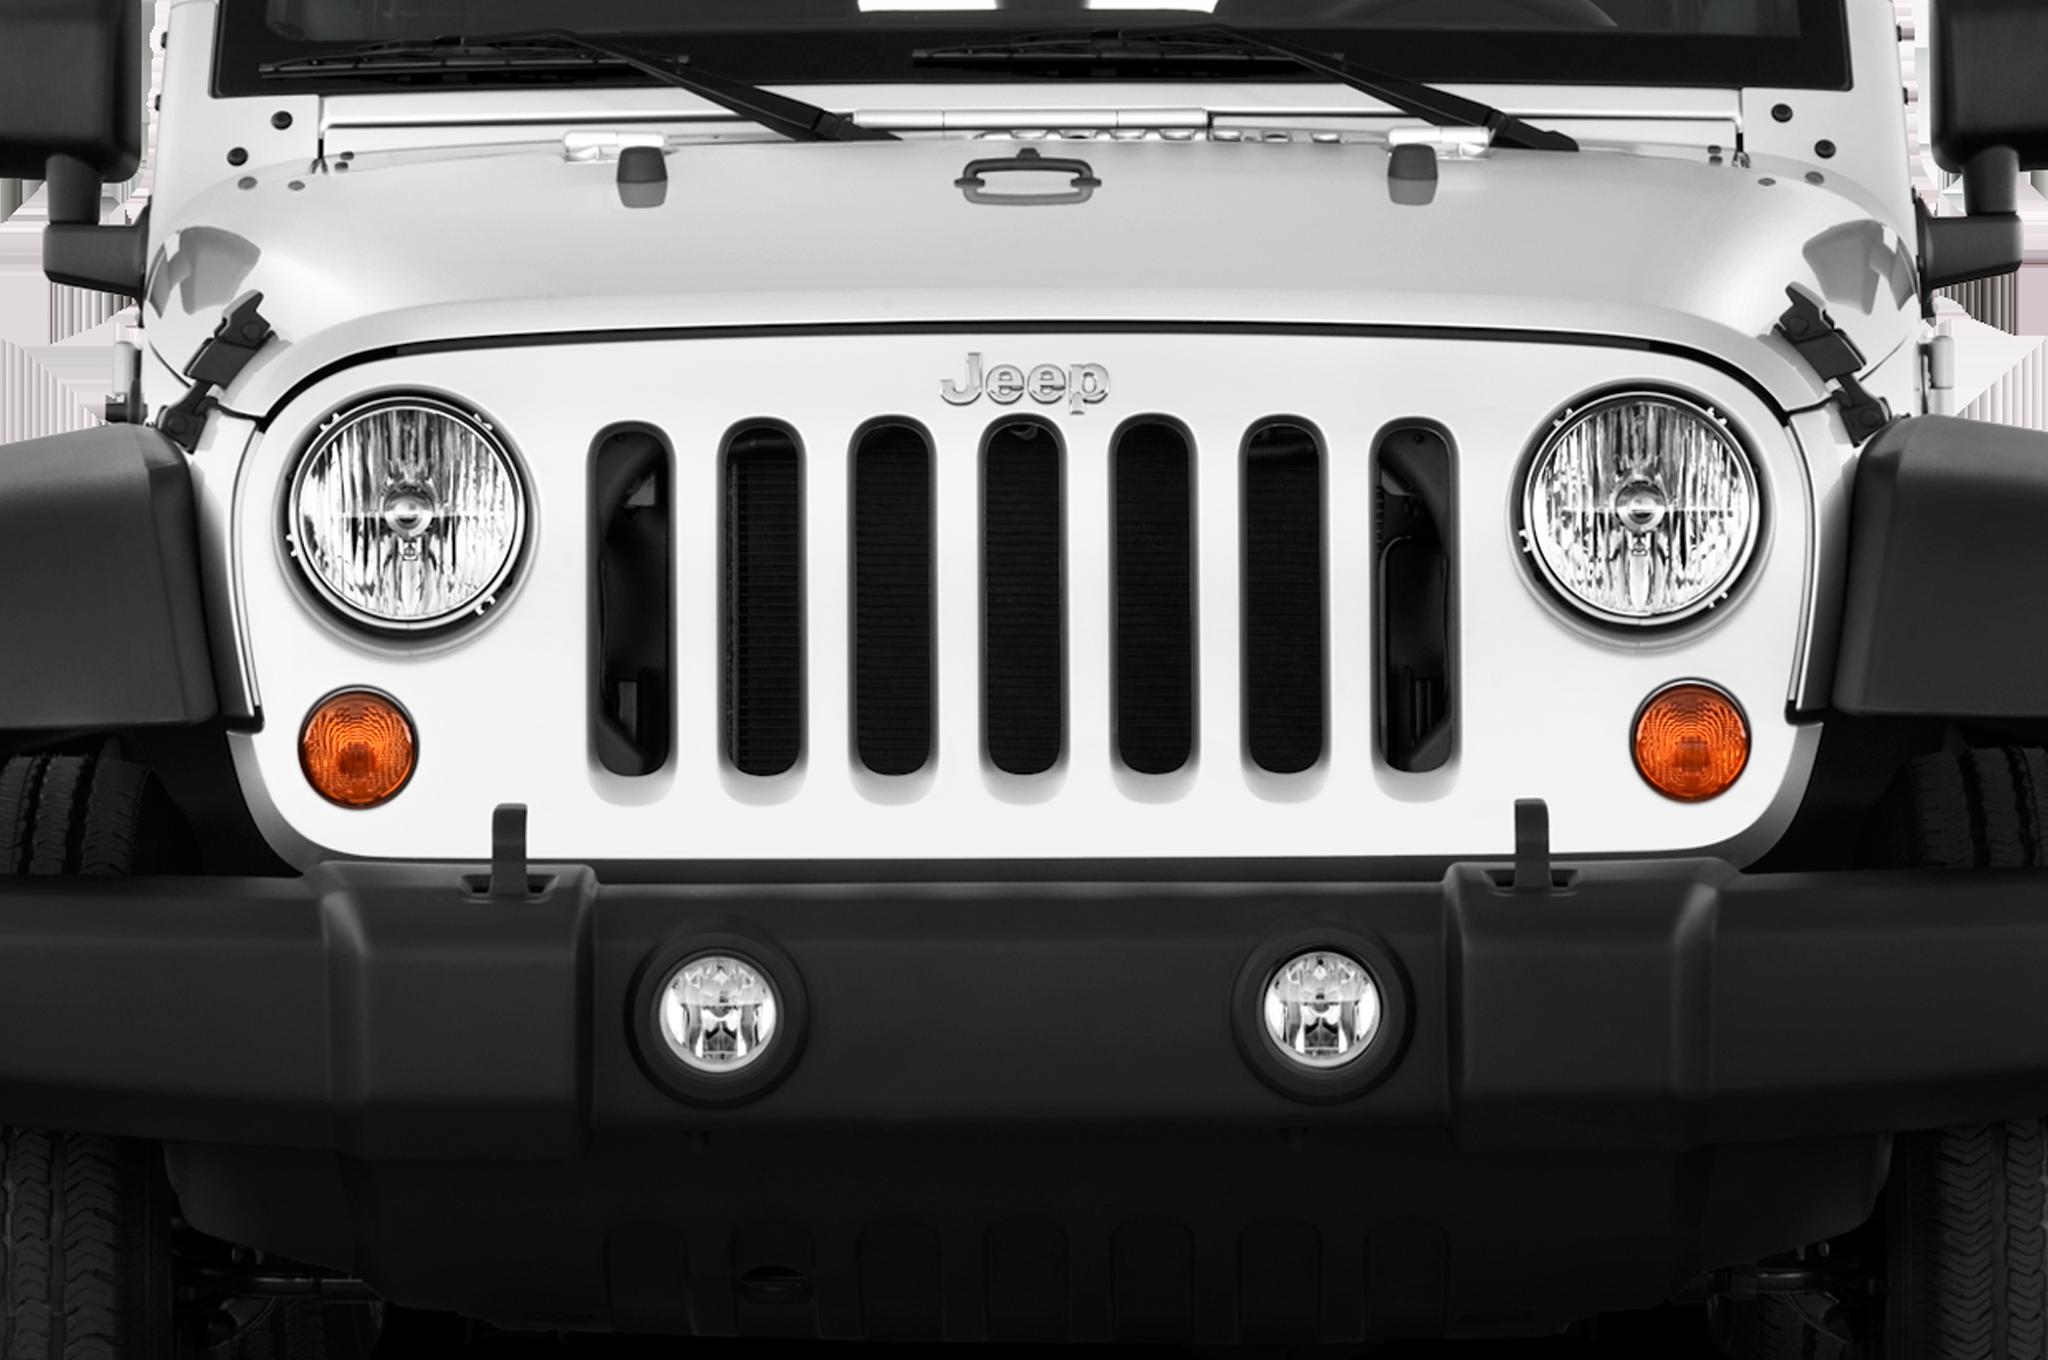 Jeep Wrangler Dealership >> Friendship Chrysler Jeep Dodge RAM of Bristol | New Chrysler, Dodge, Jeep, Ram dealership in ...